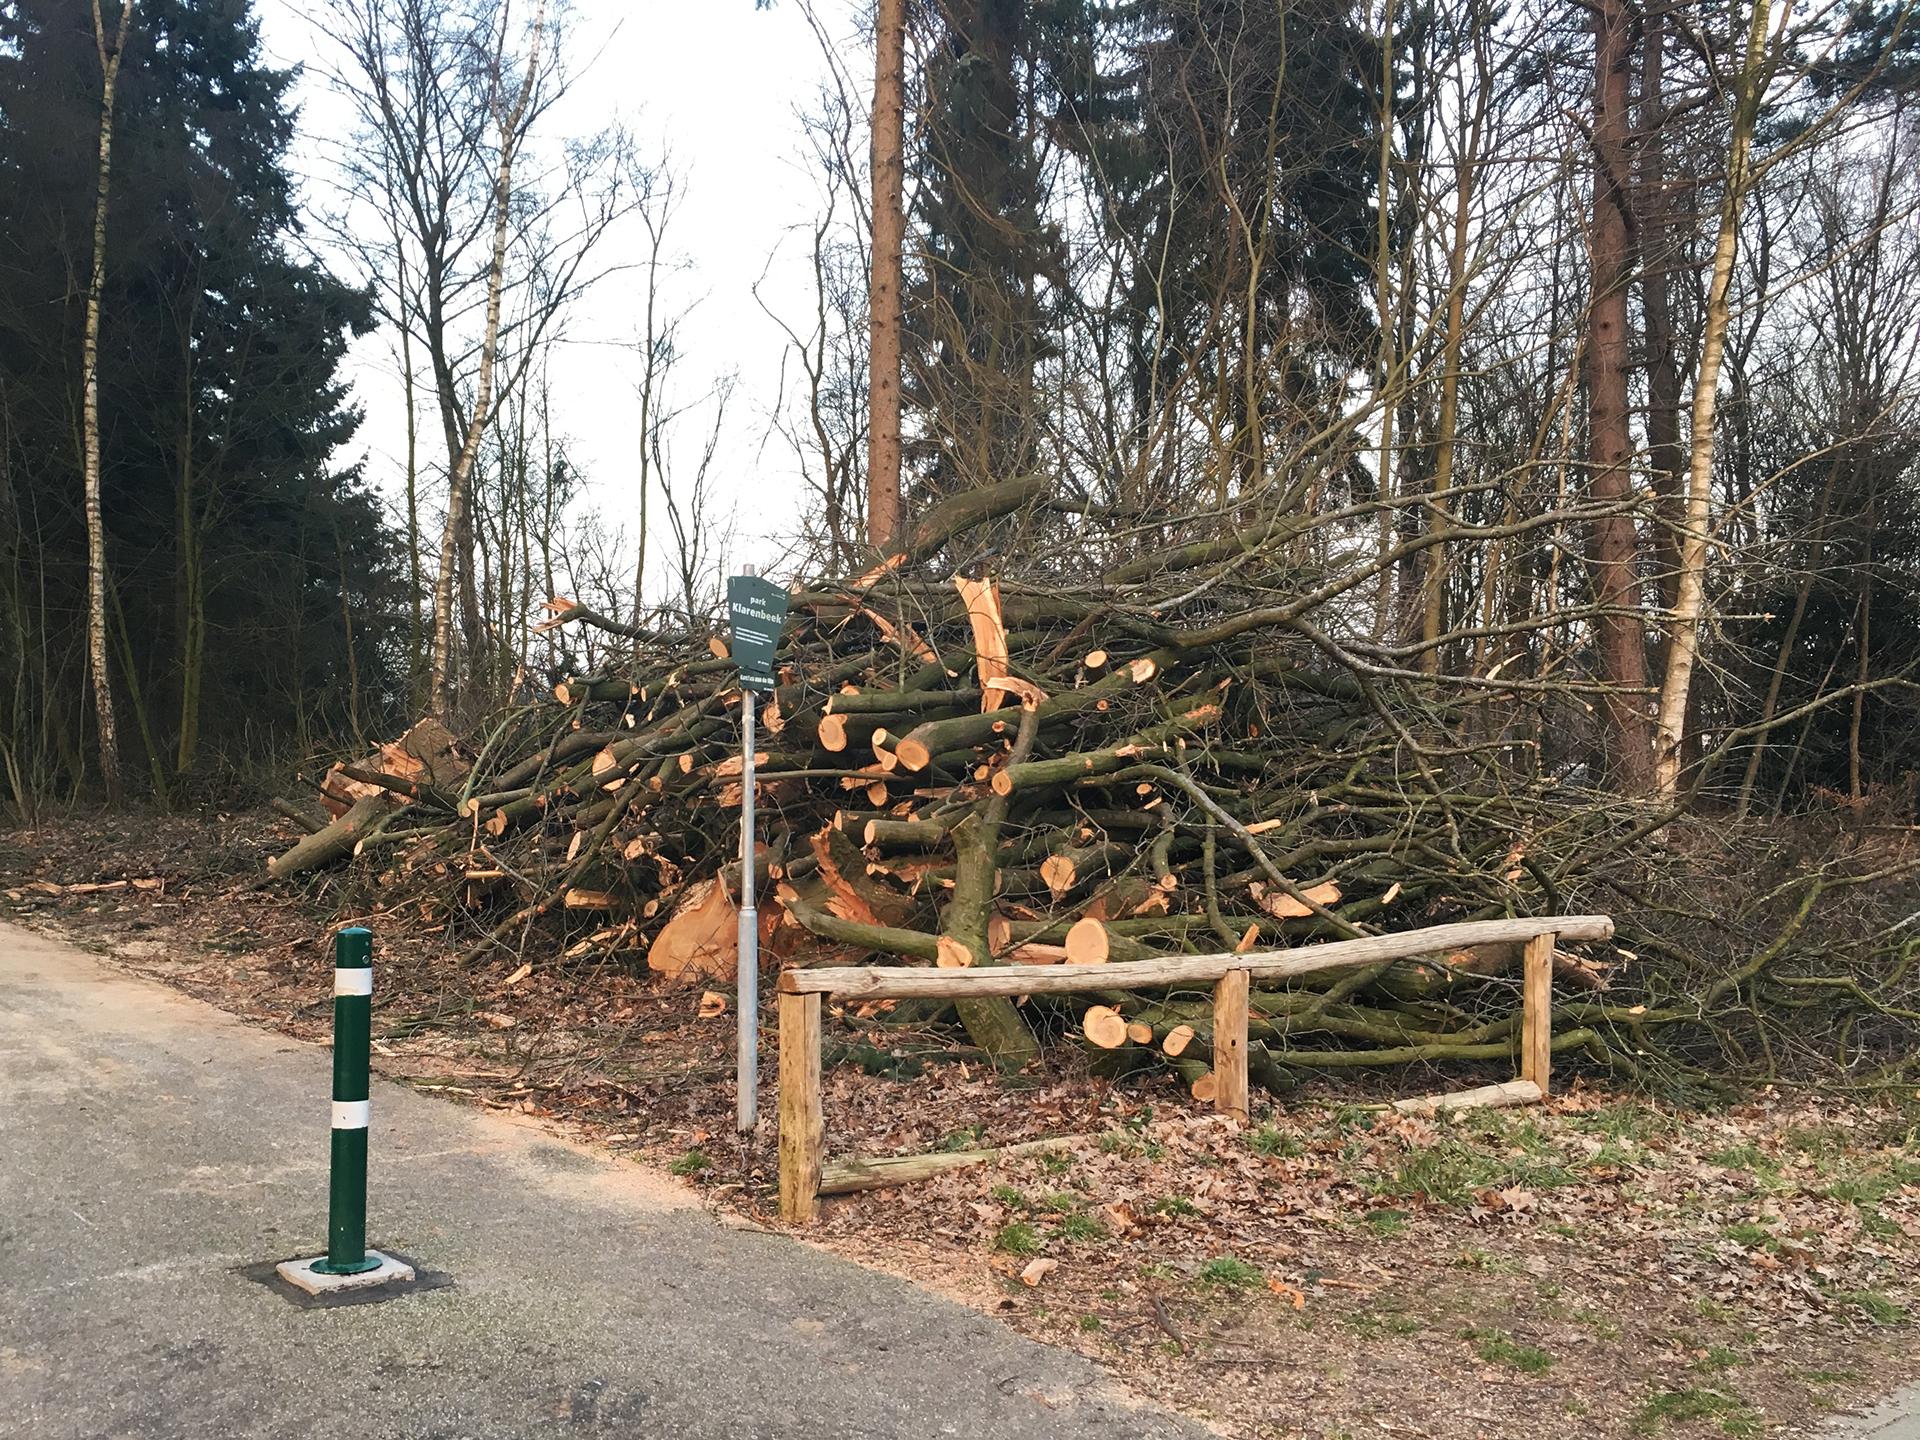 Bomen Thomas á Kempislaan gekapt